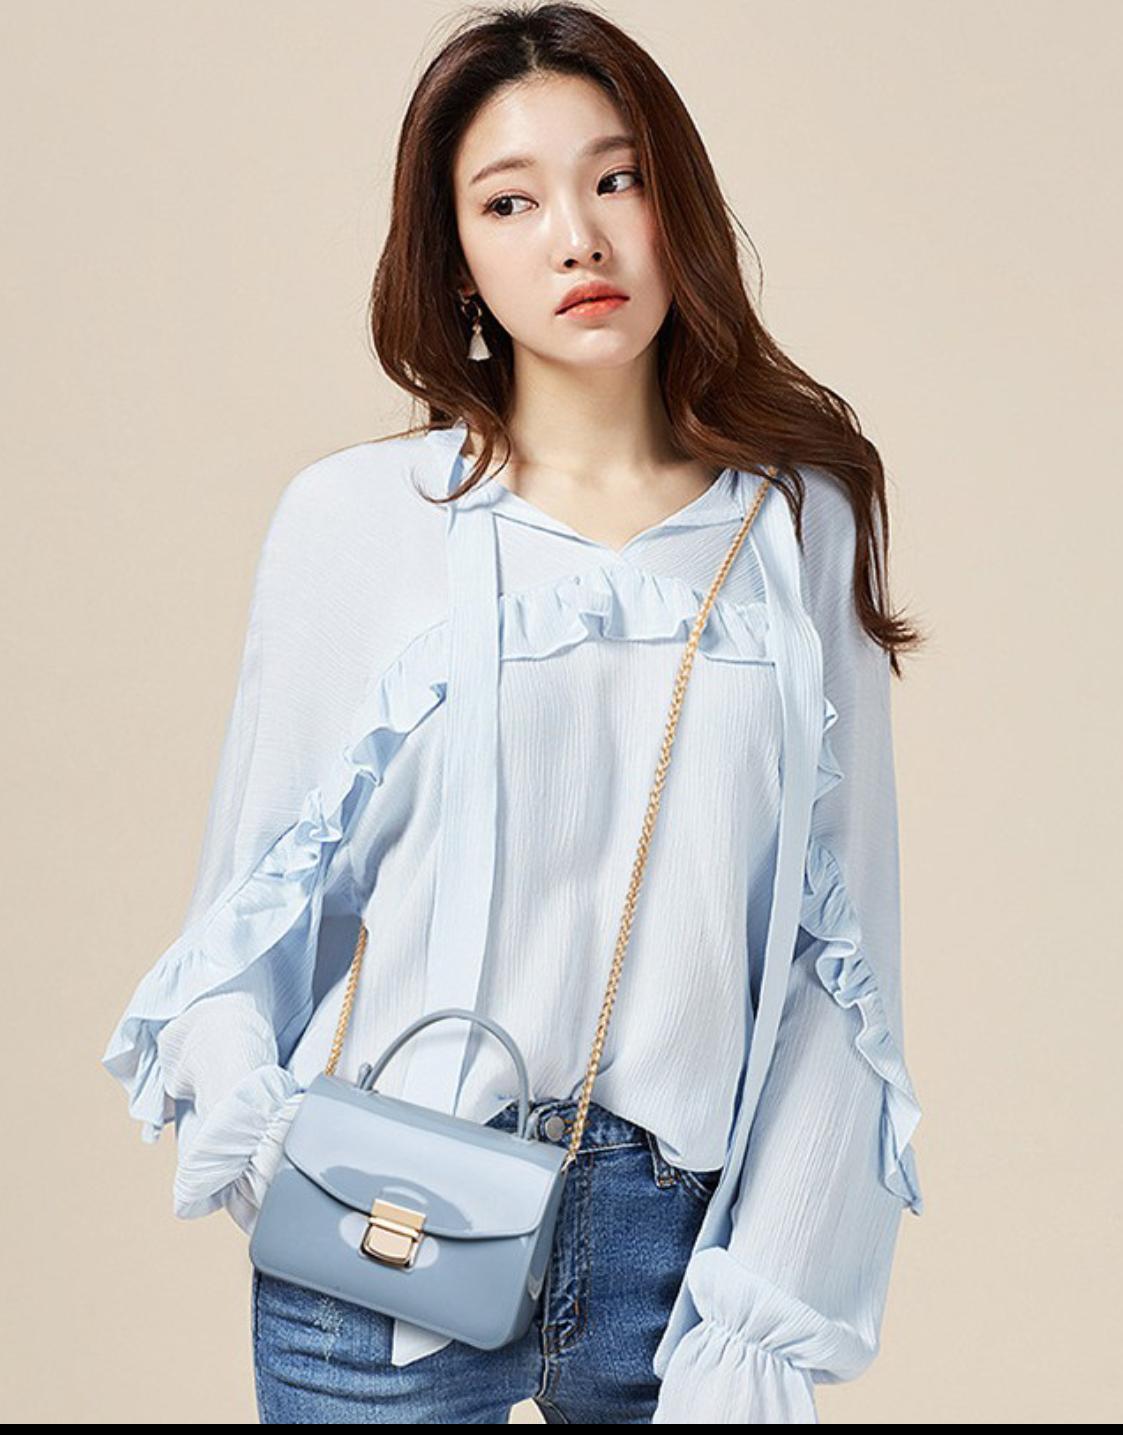 Tas Import Mini Sling Jelly Bag Wanita 17cm - Biru Muda